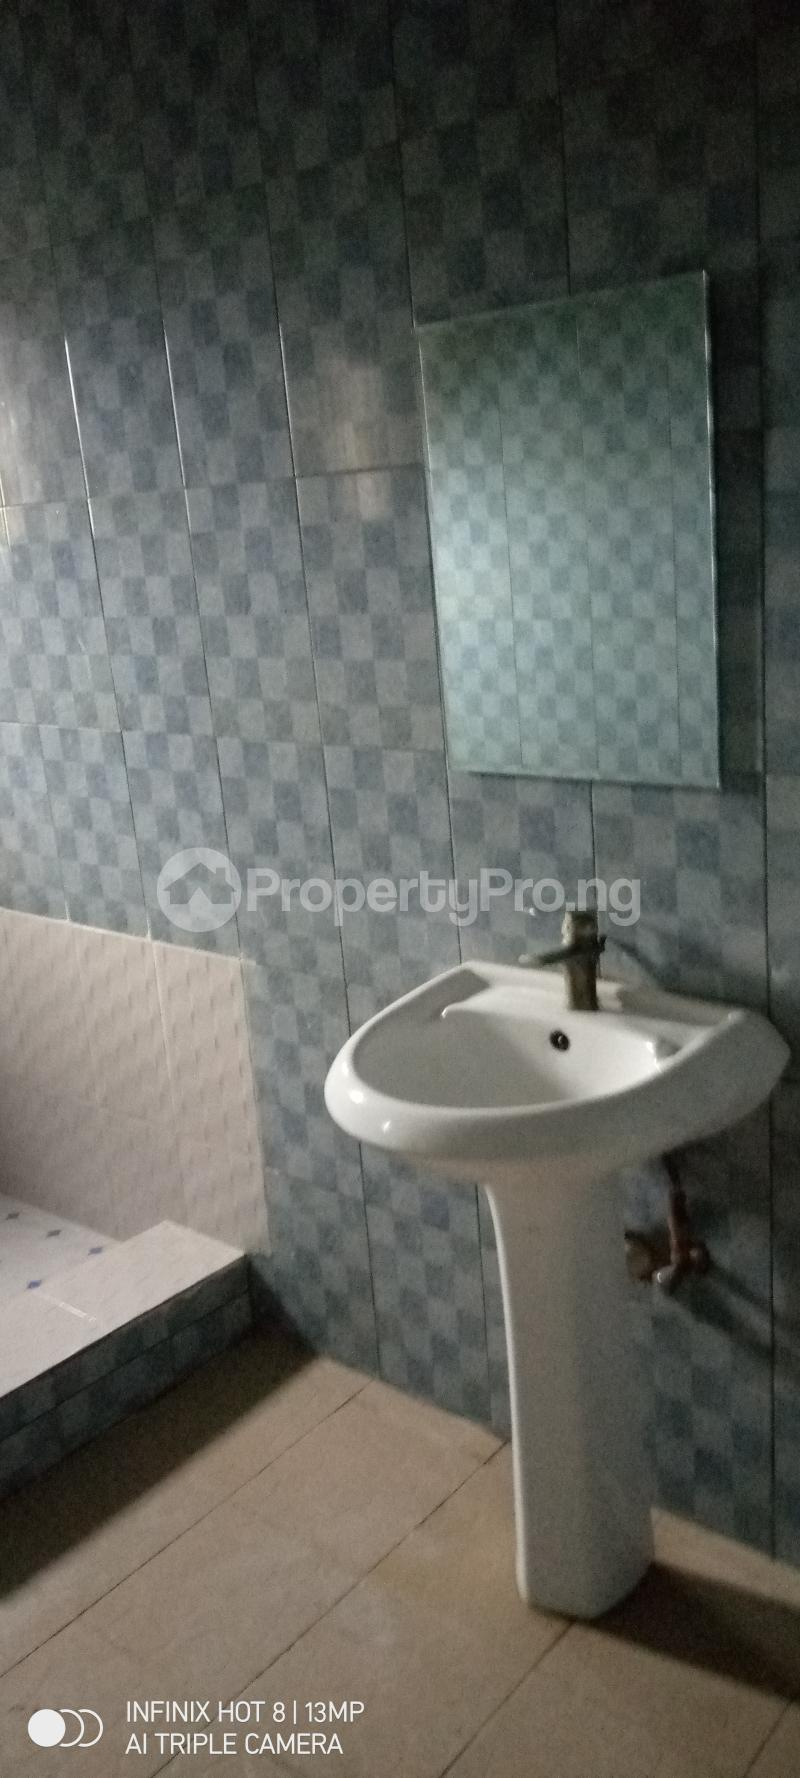 3 bedroom Flat / Apartment for rent Green field estate Amuwo Odofin Amuwo Odofin Lagos - 12